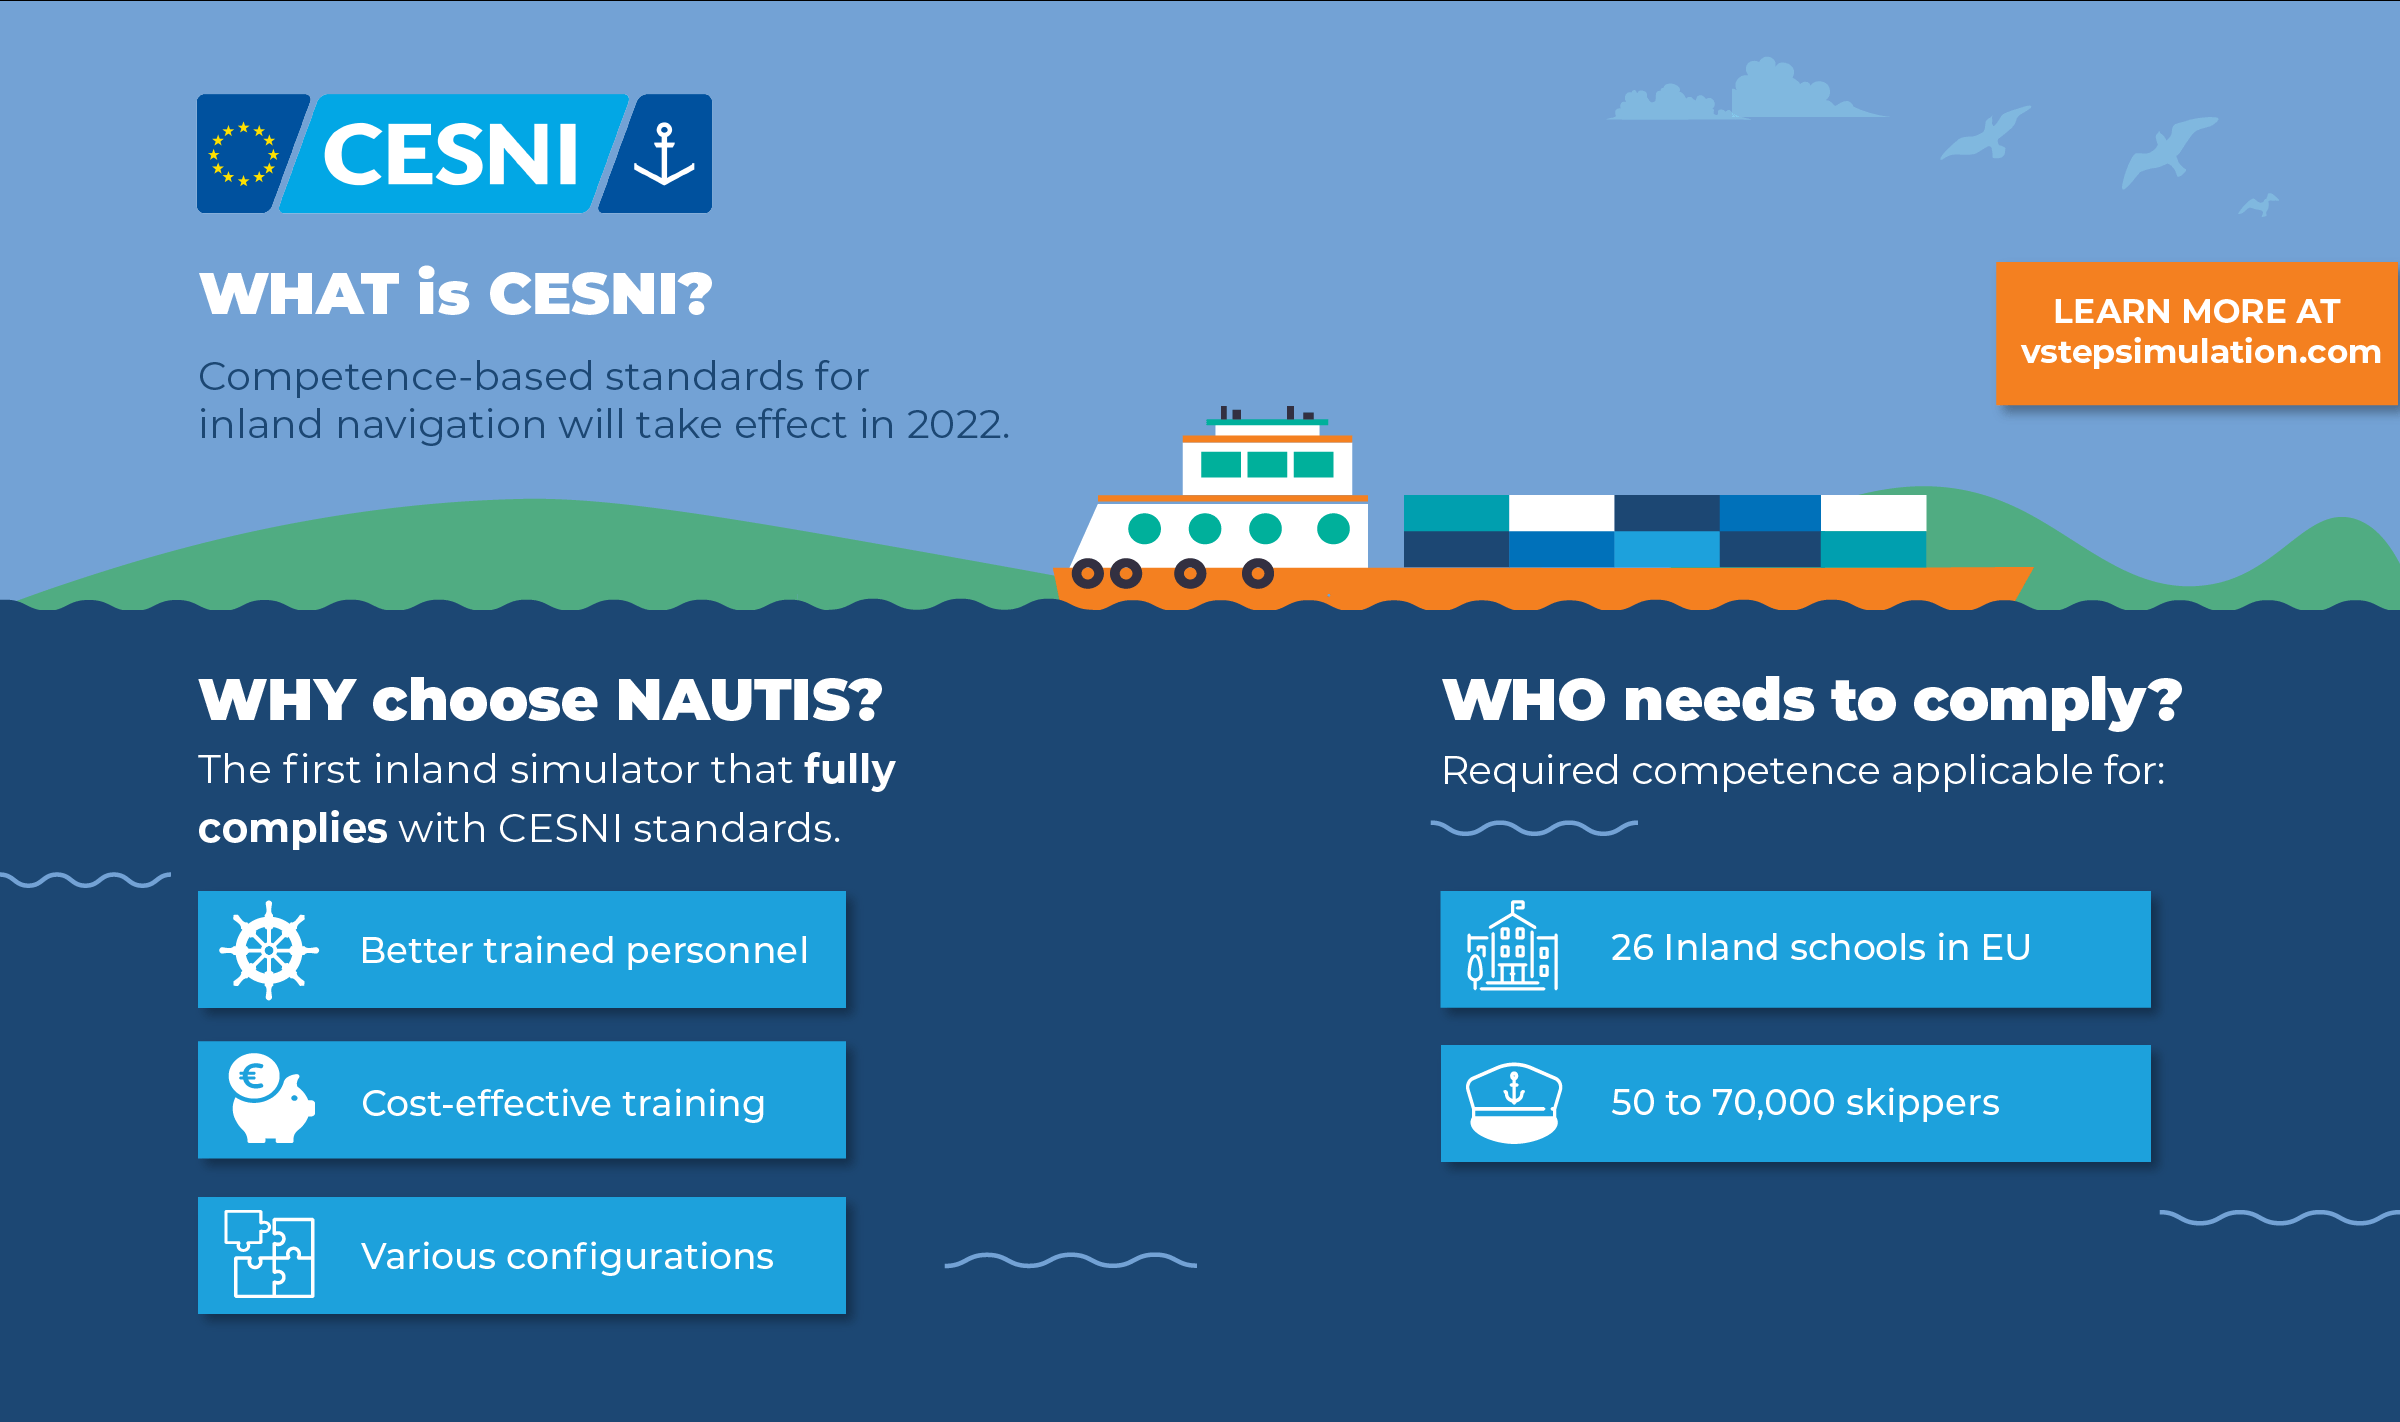 CESNI Infographic